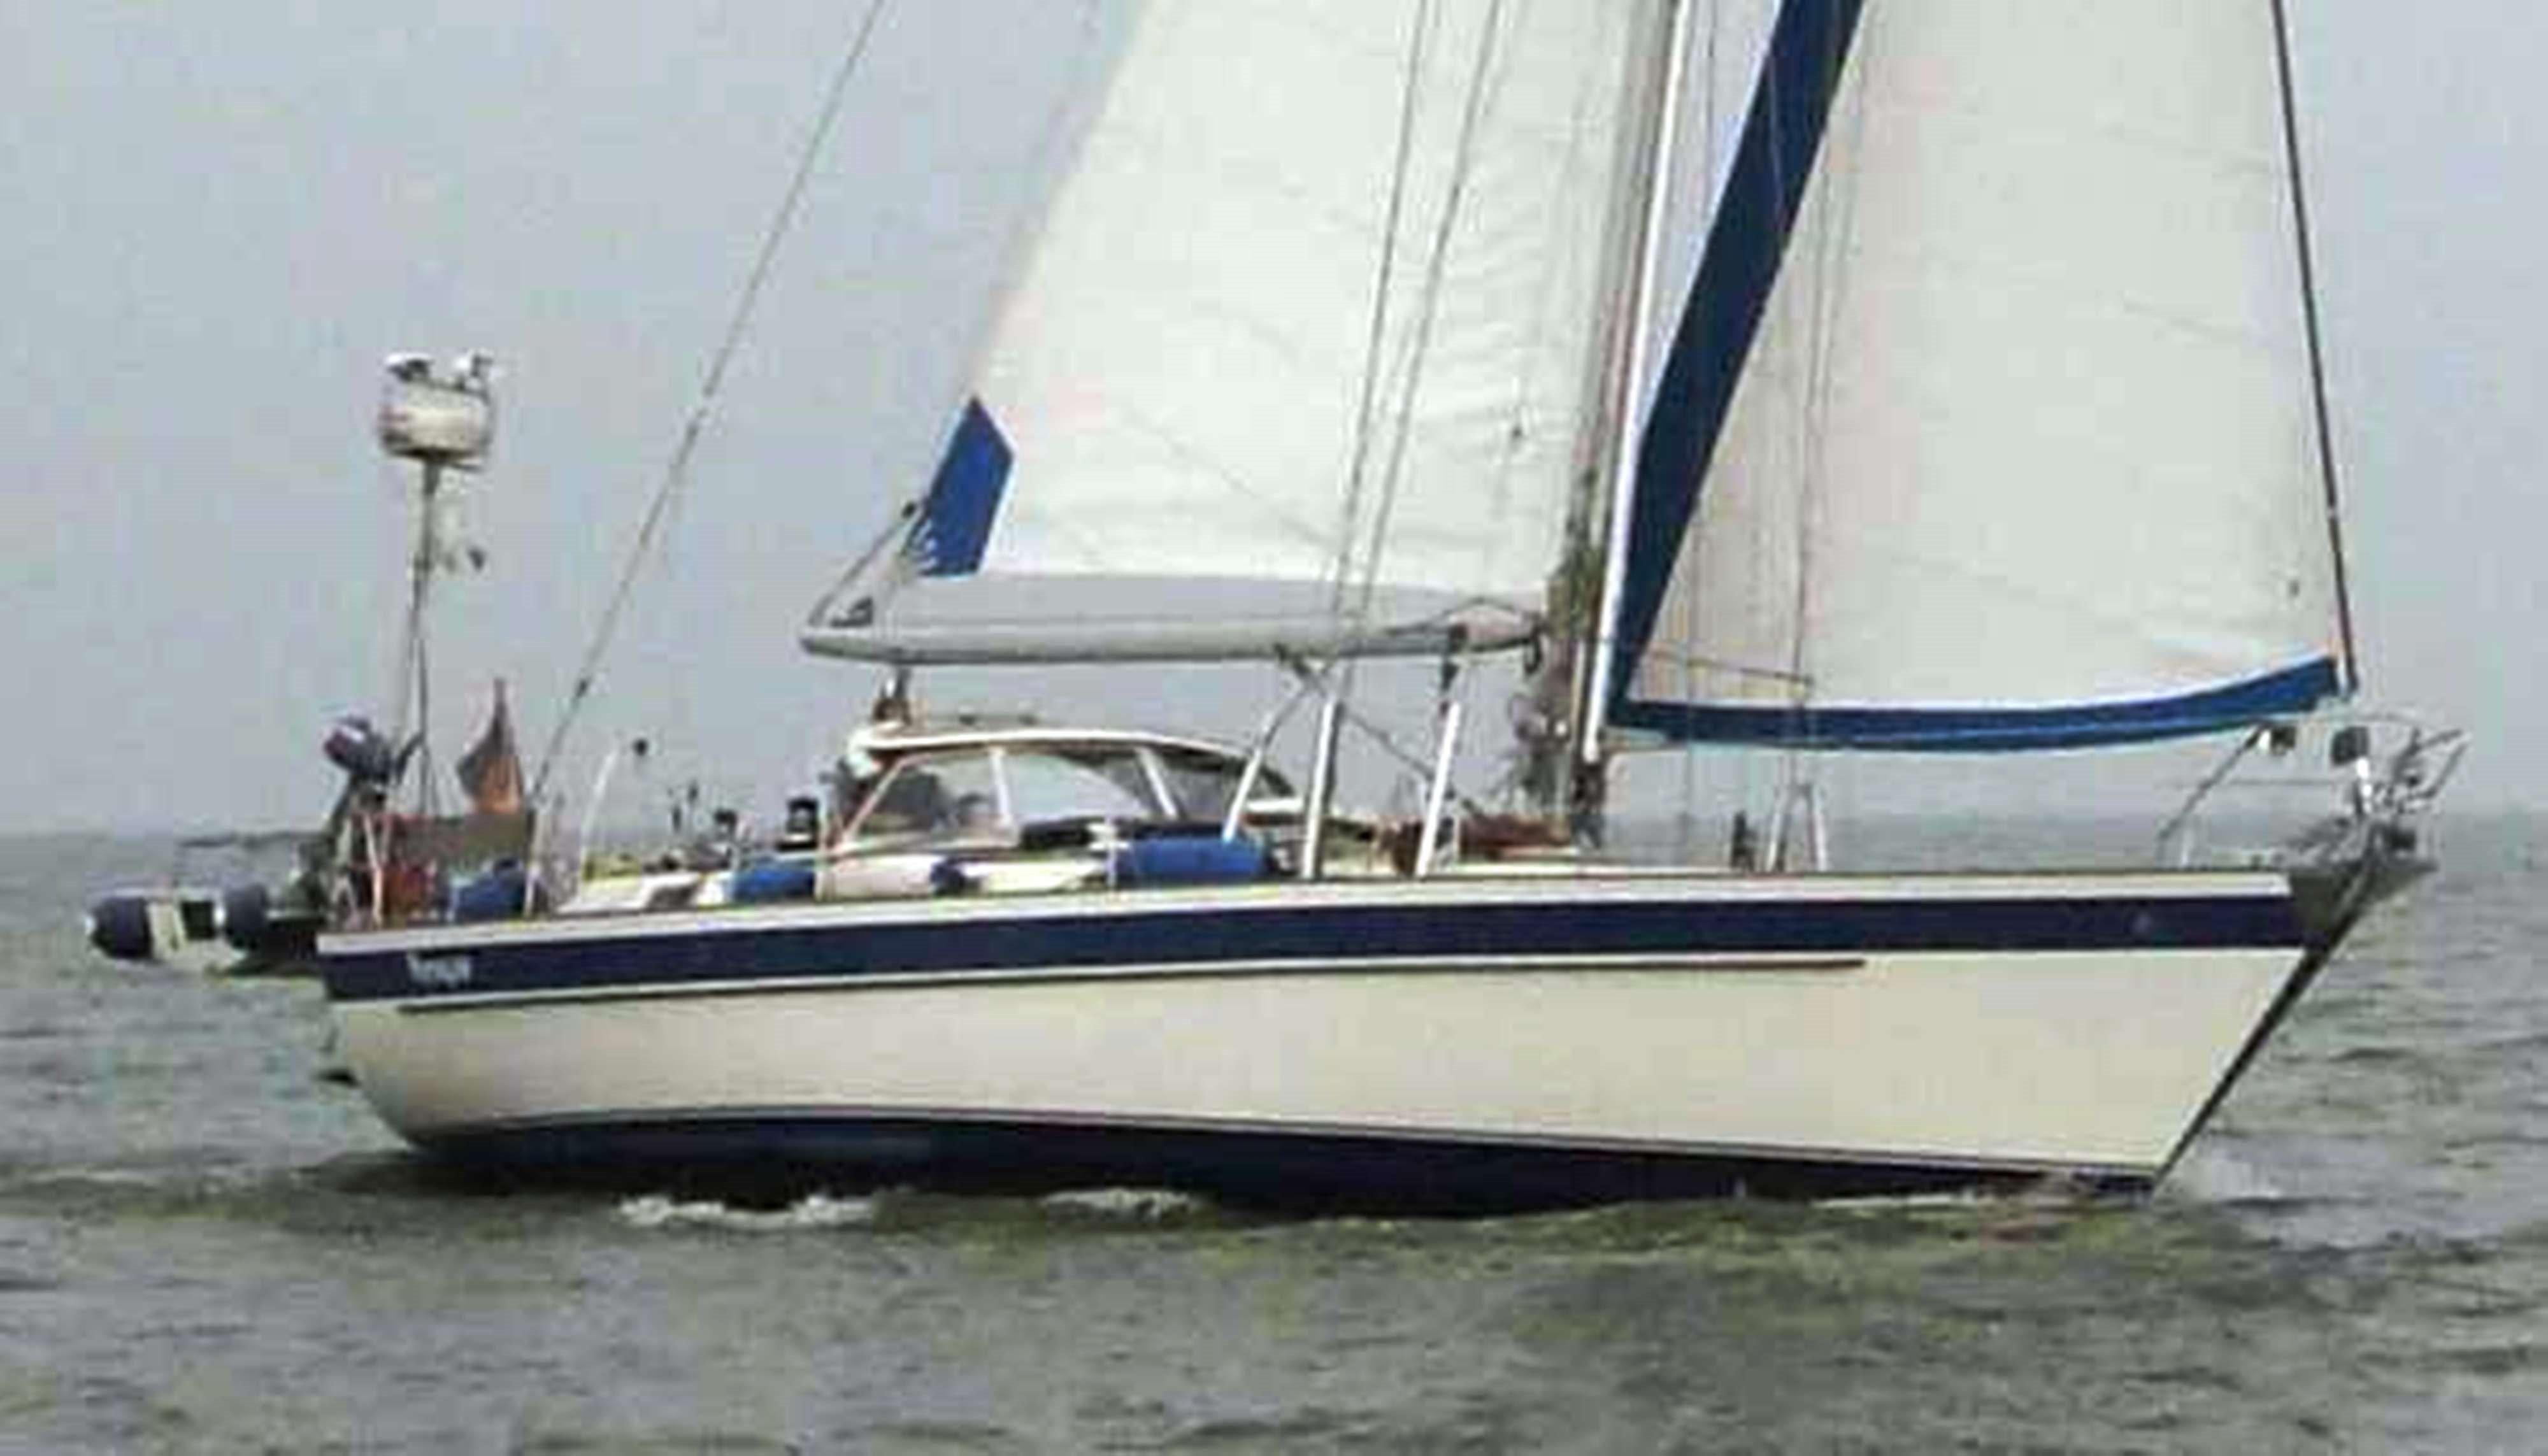 1989 Hallberg Rassy 45 Sail Boat For Sale Www Yachtworld Com